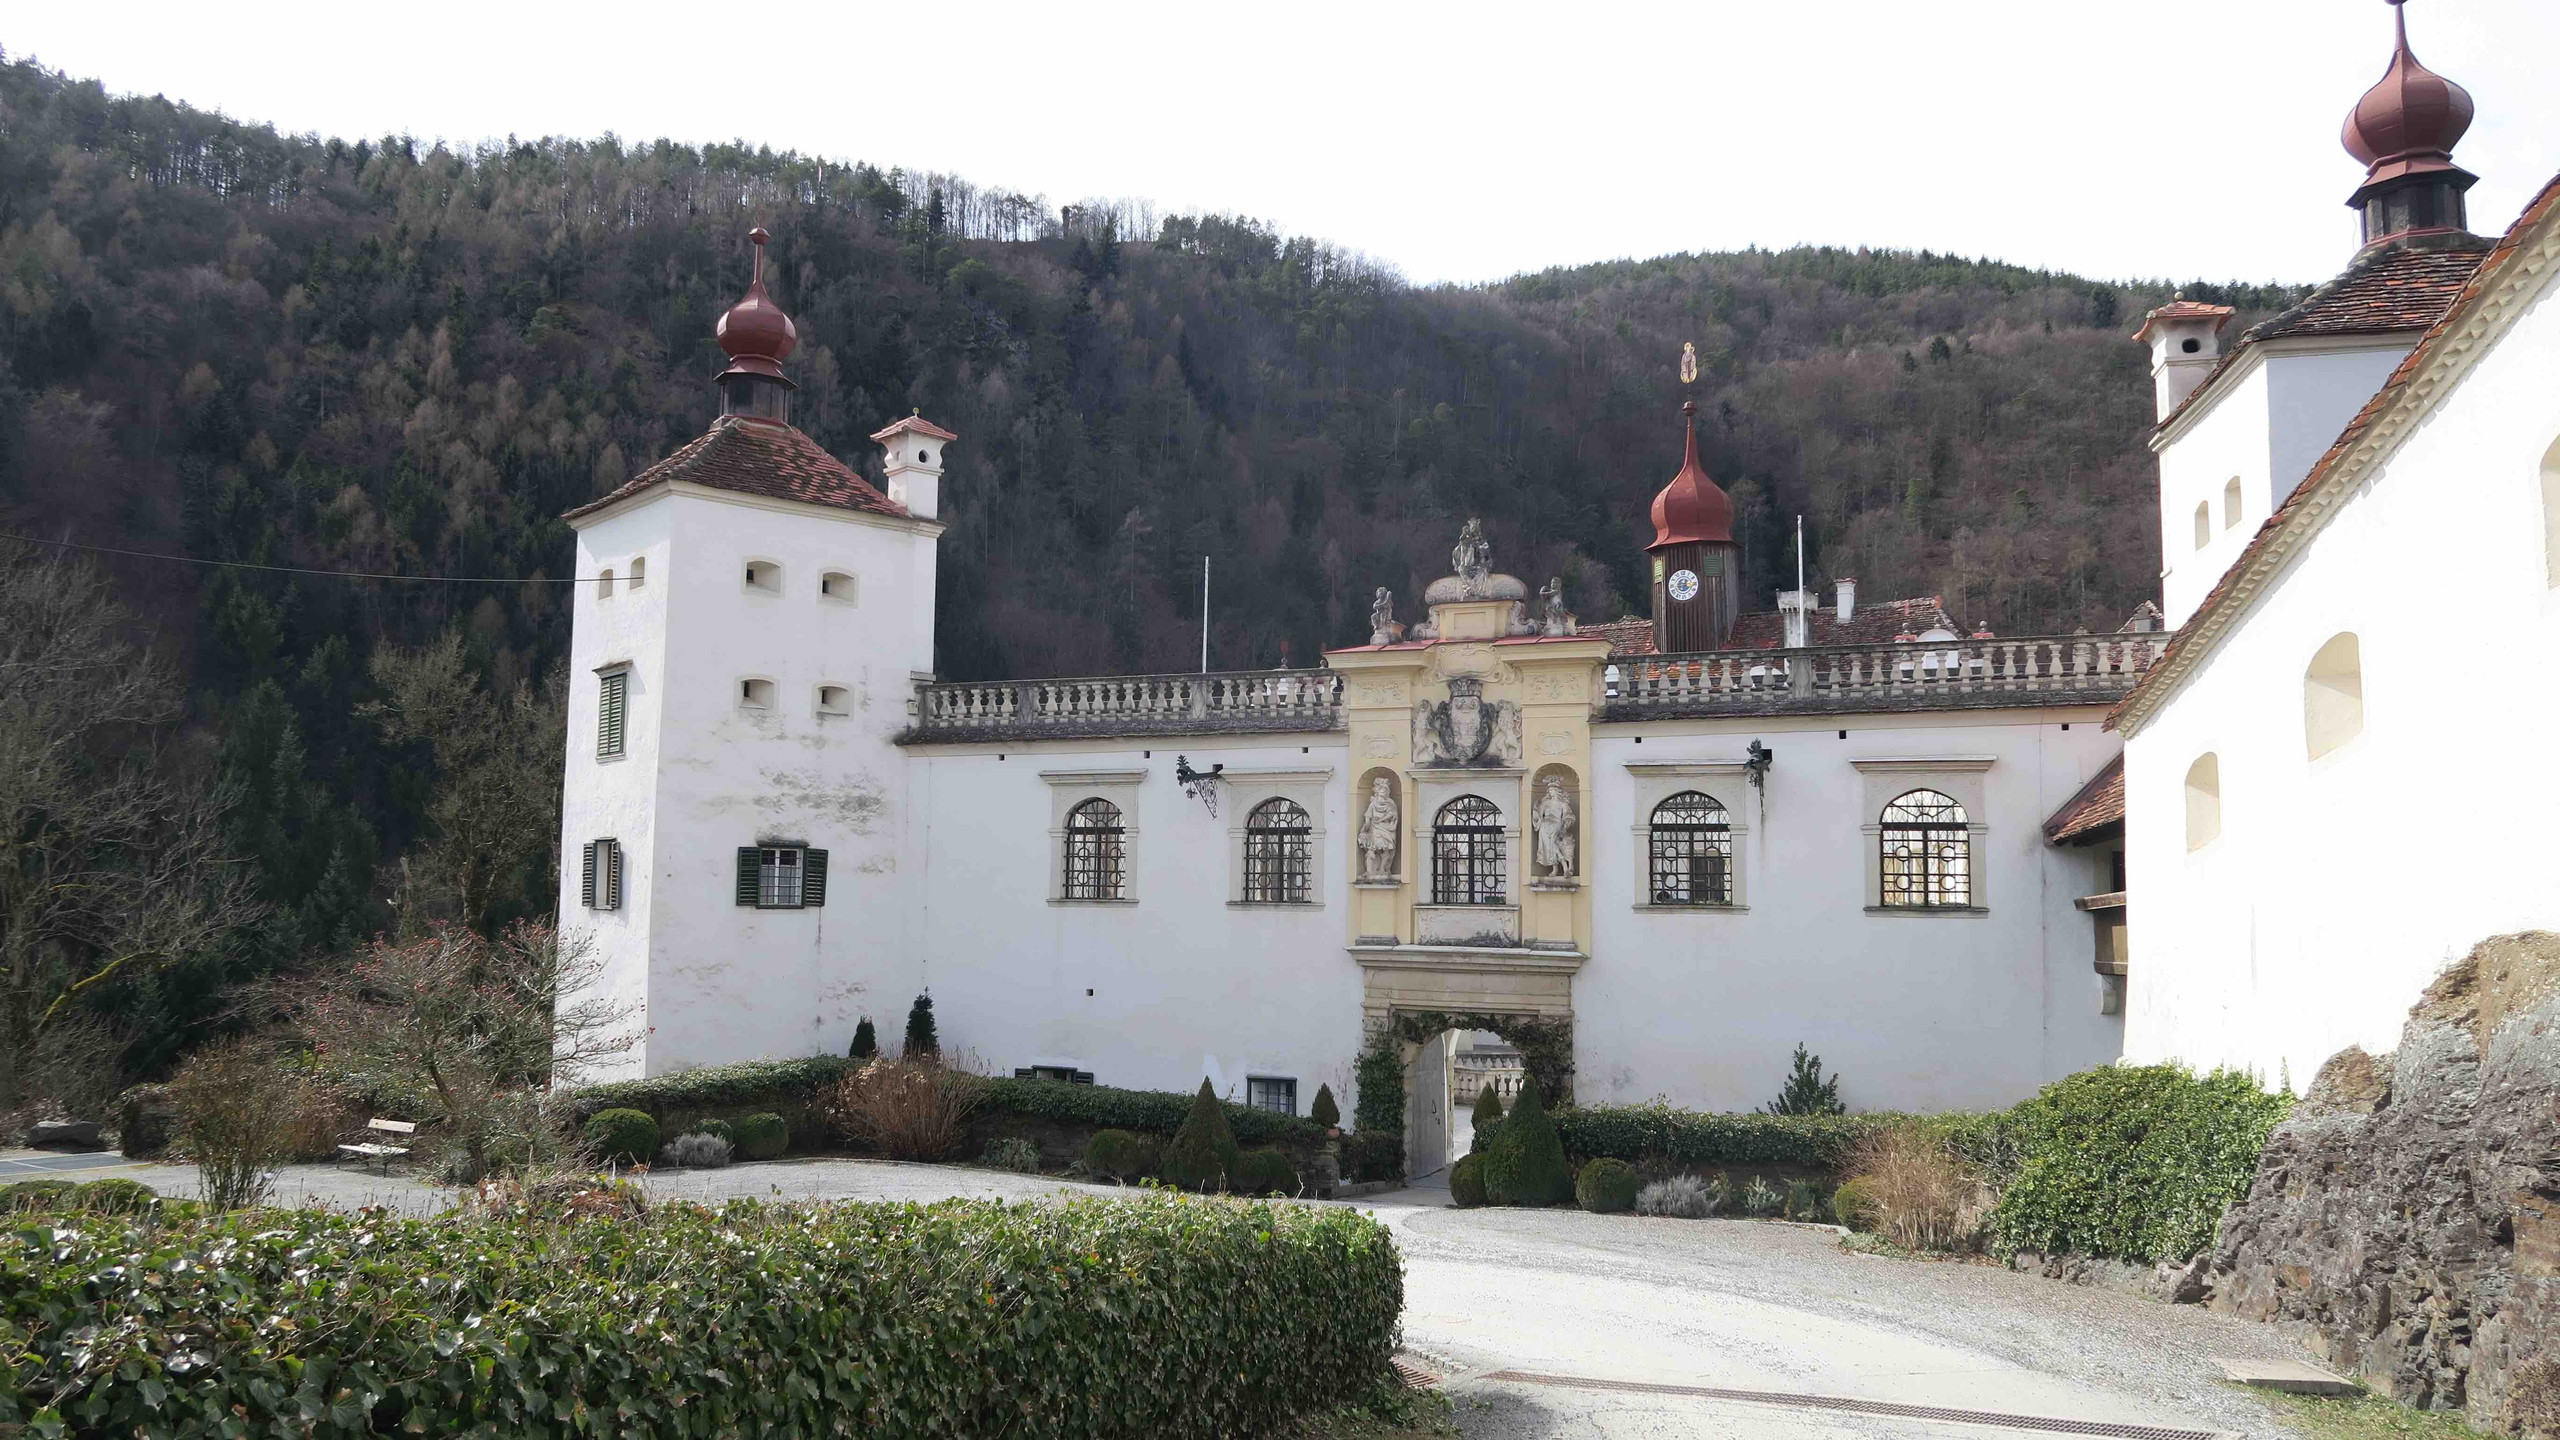 IMG_1626 Schloss Herberstein Austria 2017 Wilhelm W. Kohl kopie